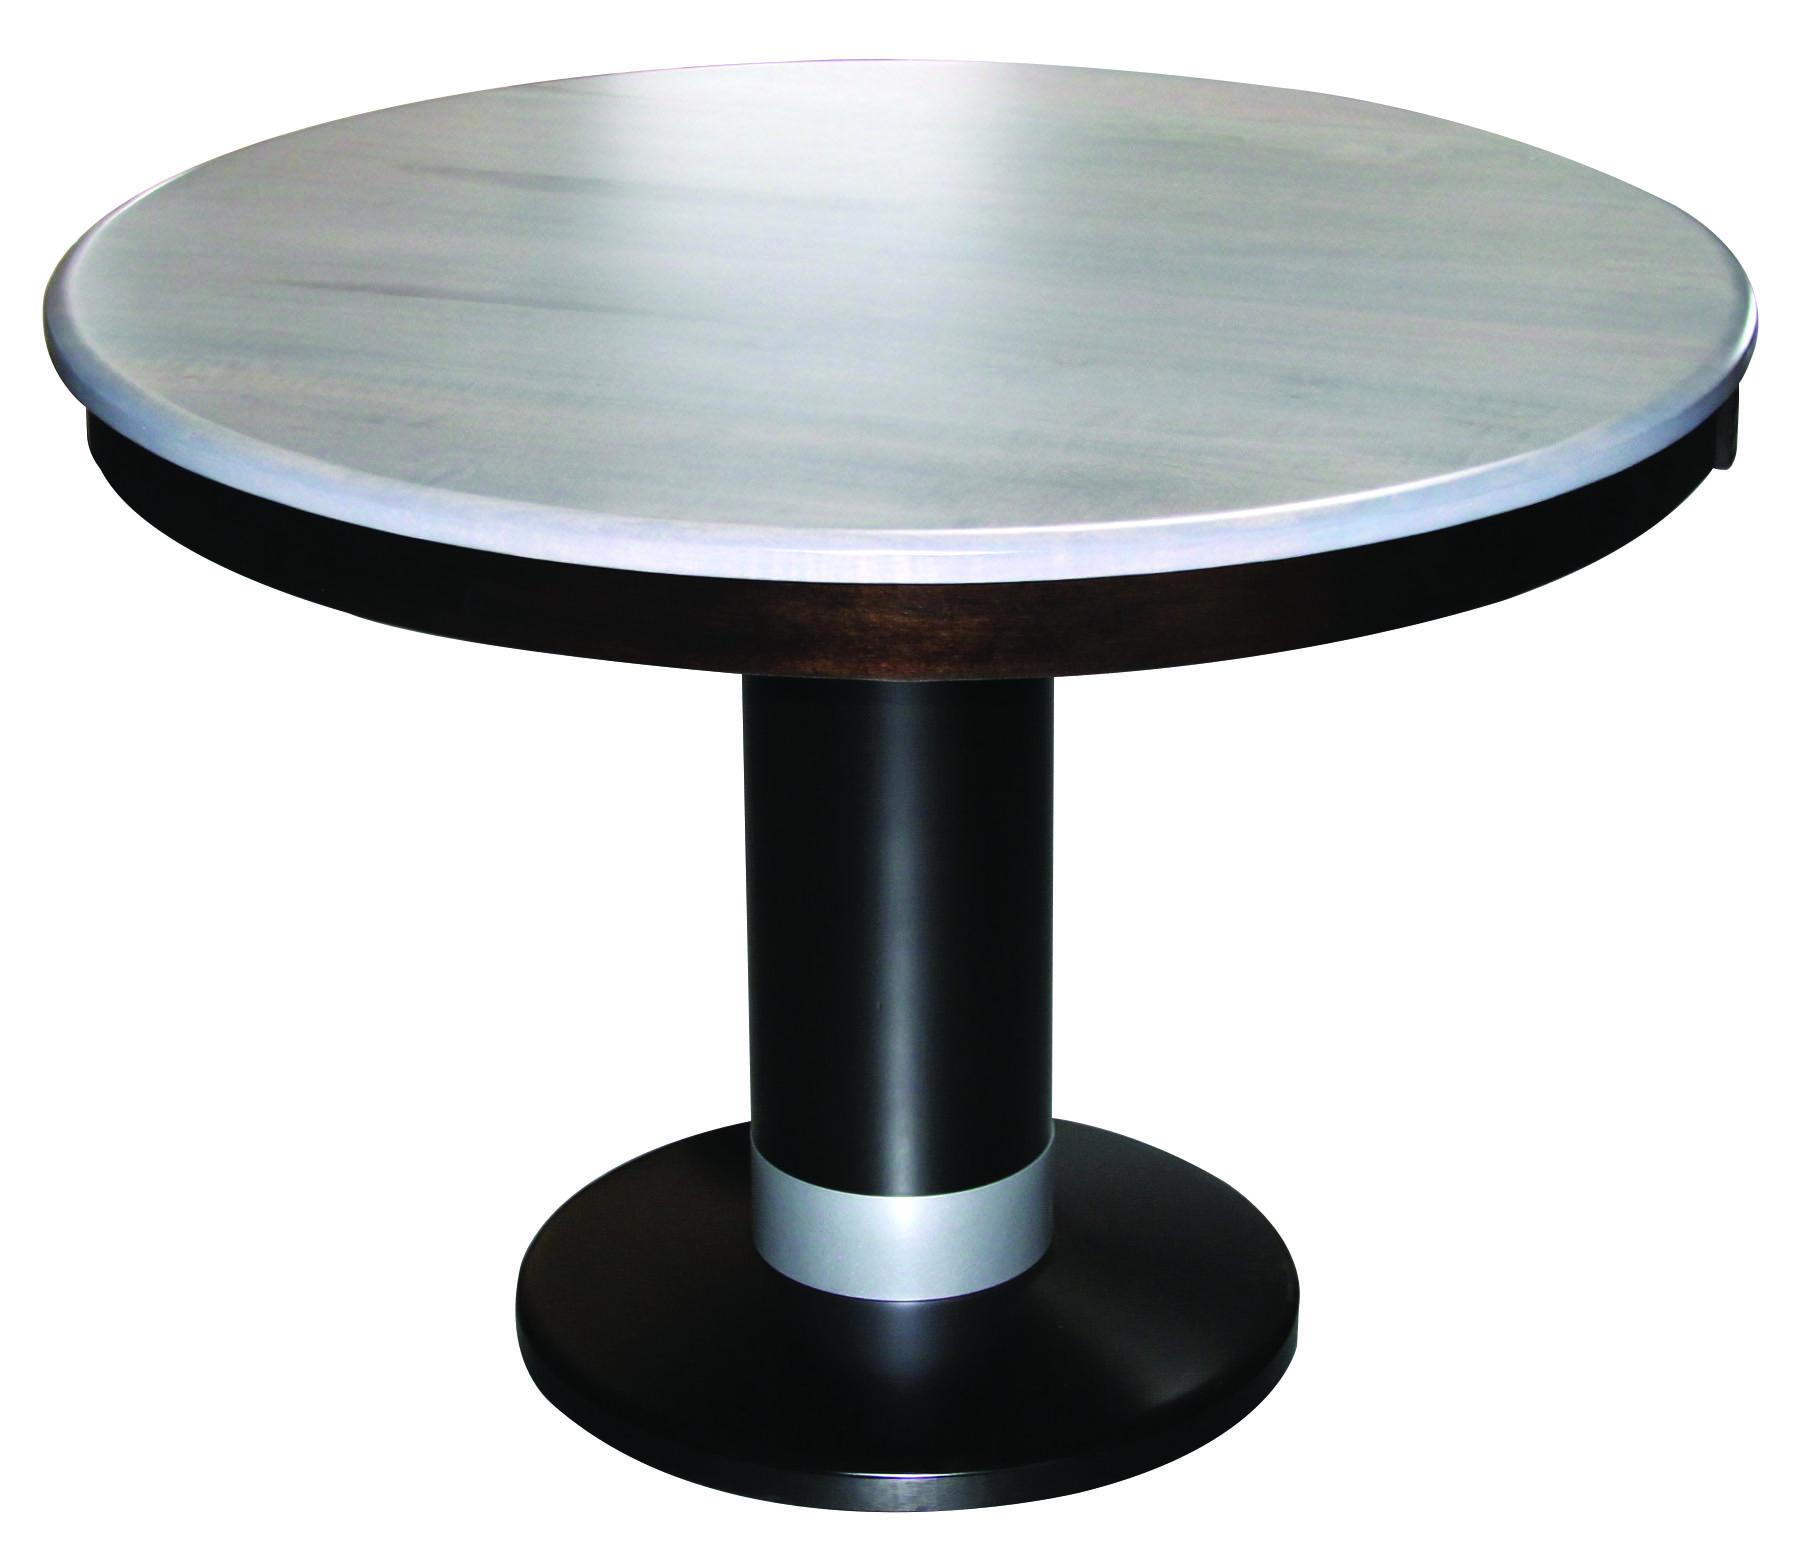 Alcoe Round Single Pedestal.jpg